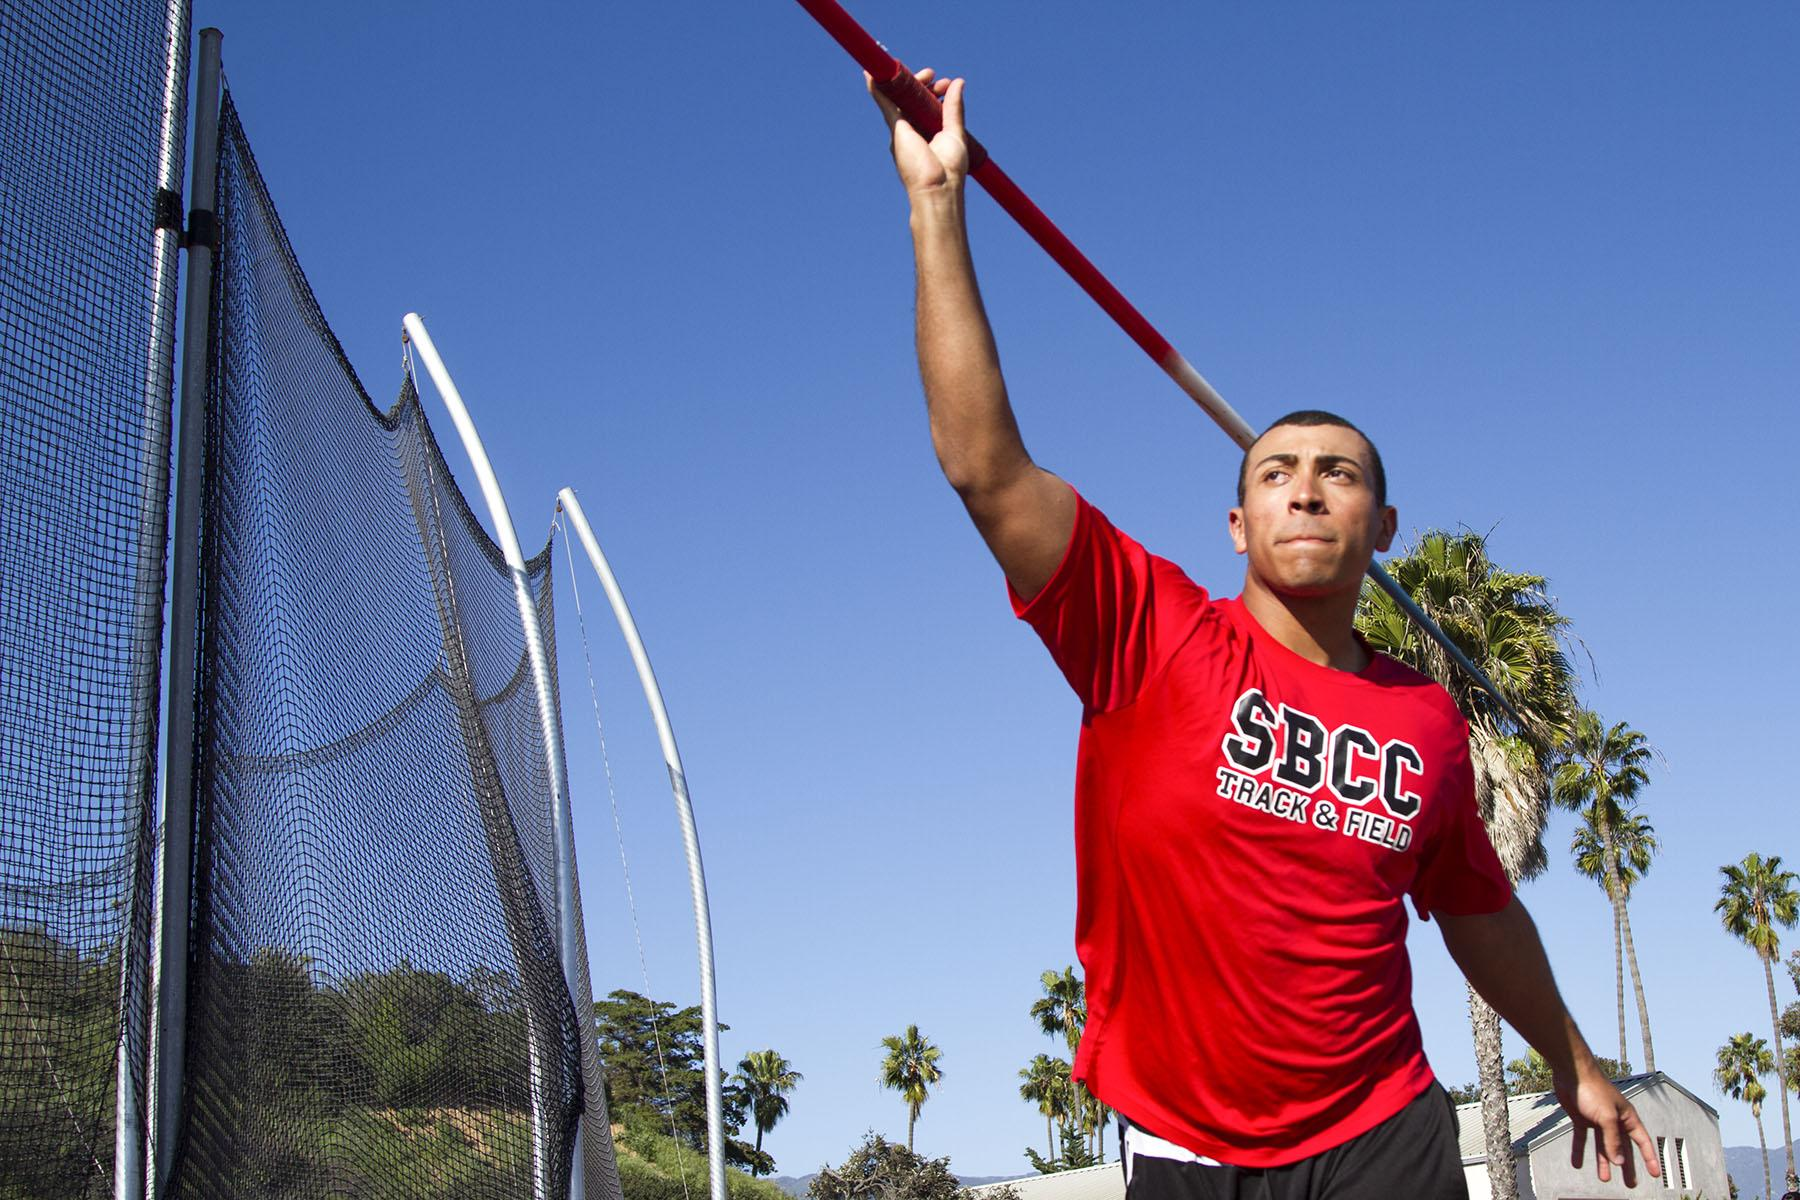 Sophomore Thrower Eddie Jones throws a javelin on Wednesday, March 15, at La Playa Stadium. Though Jones is best at shot put, he prefers the javelin.